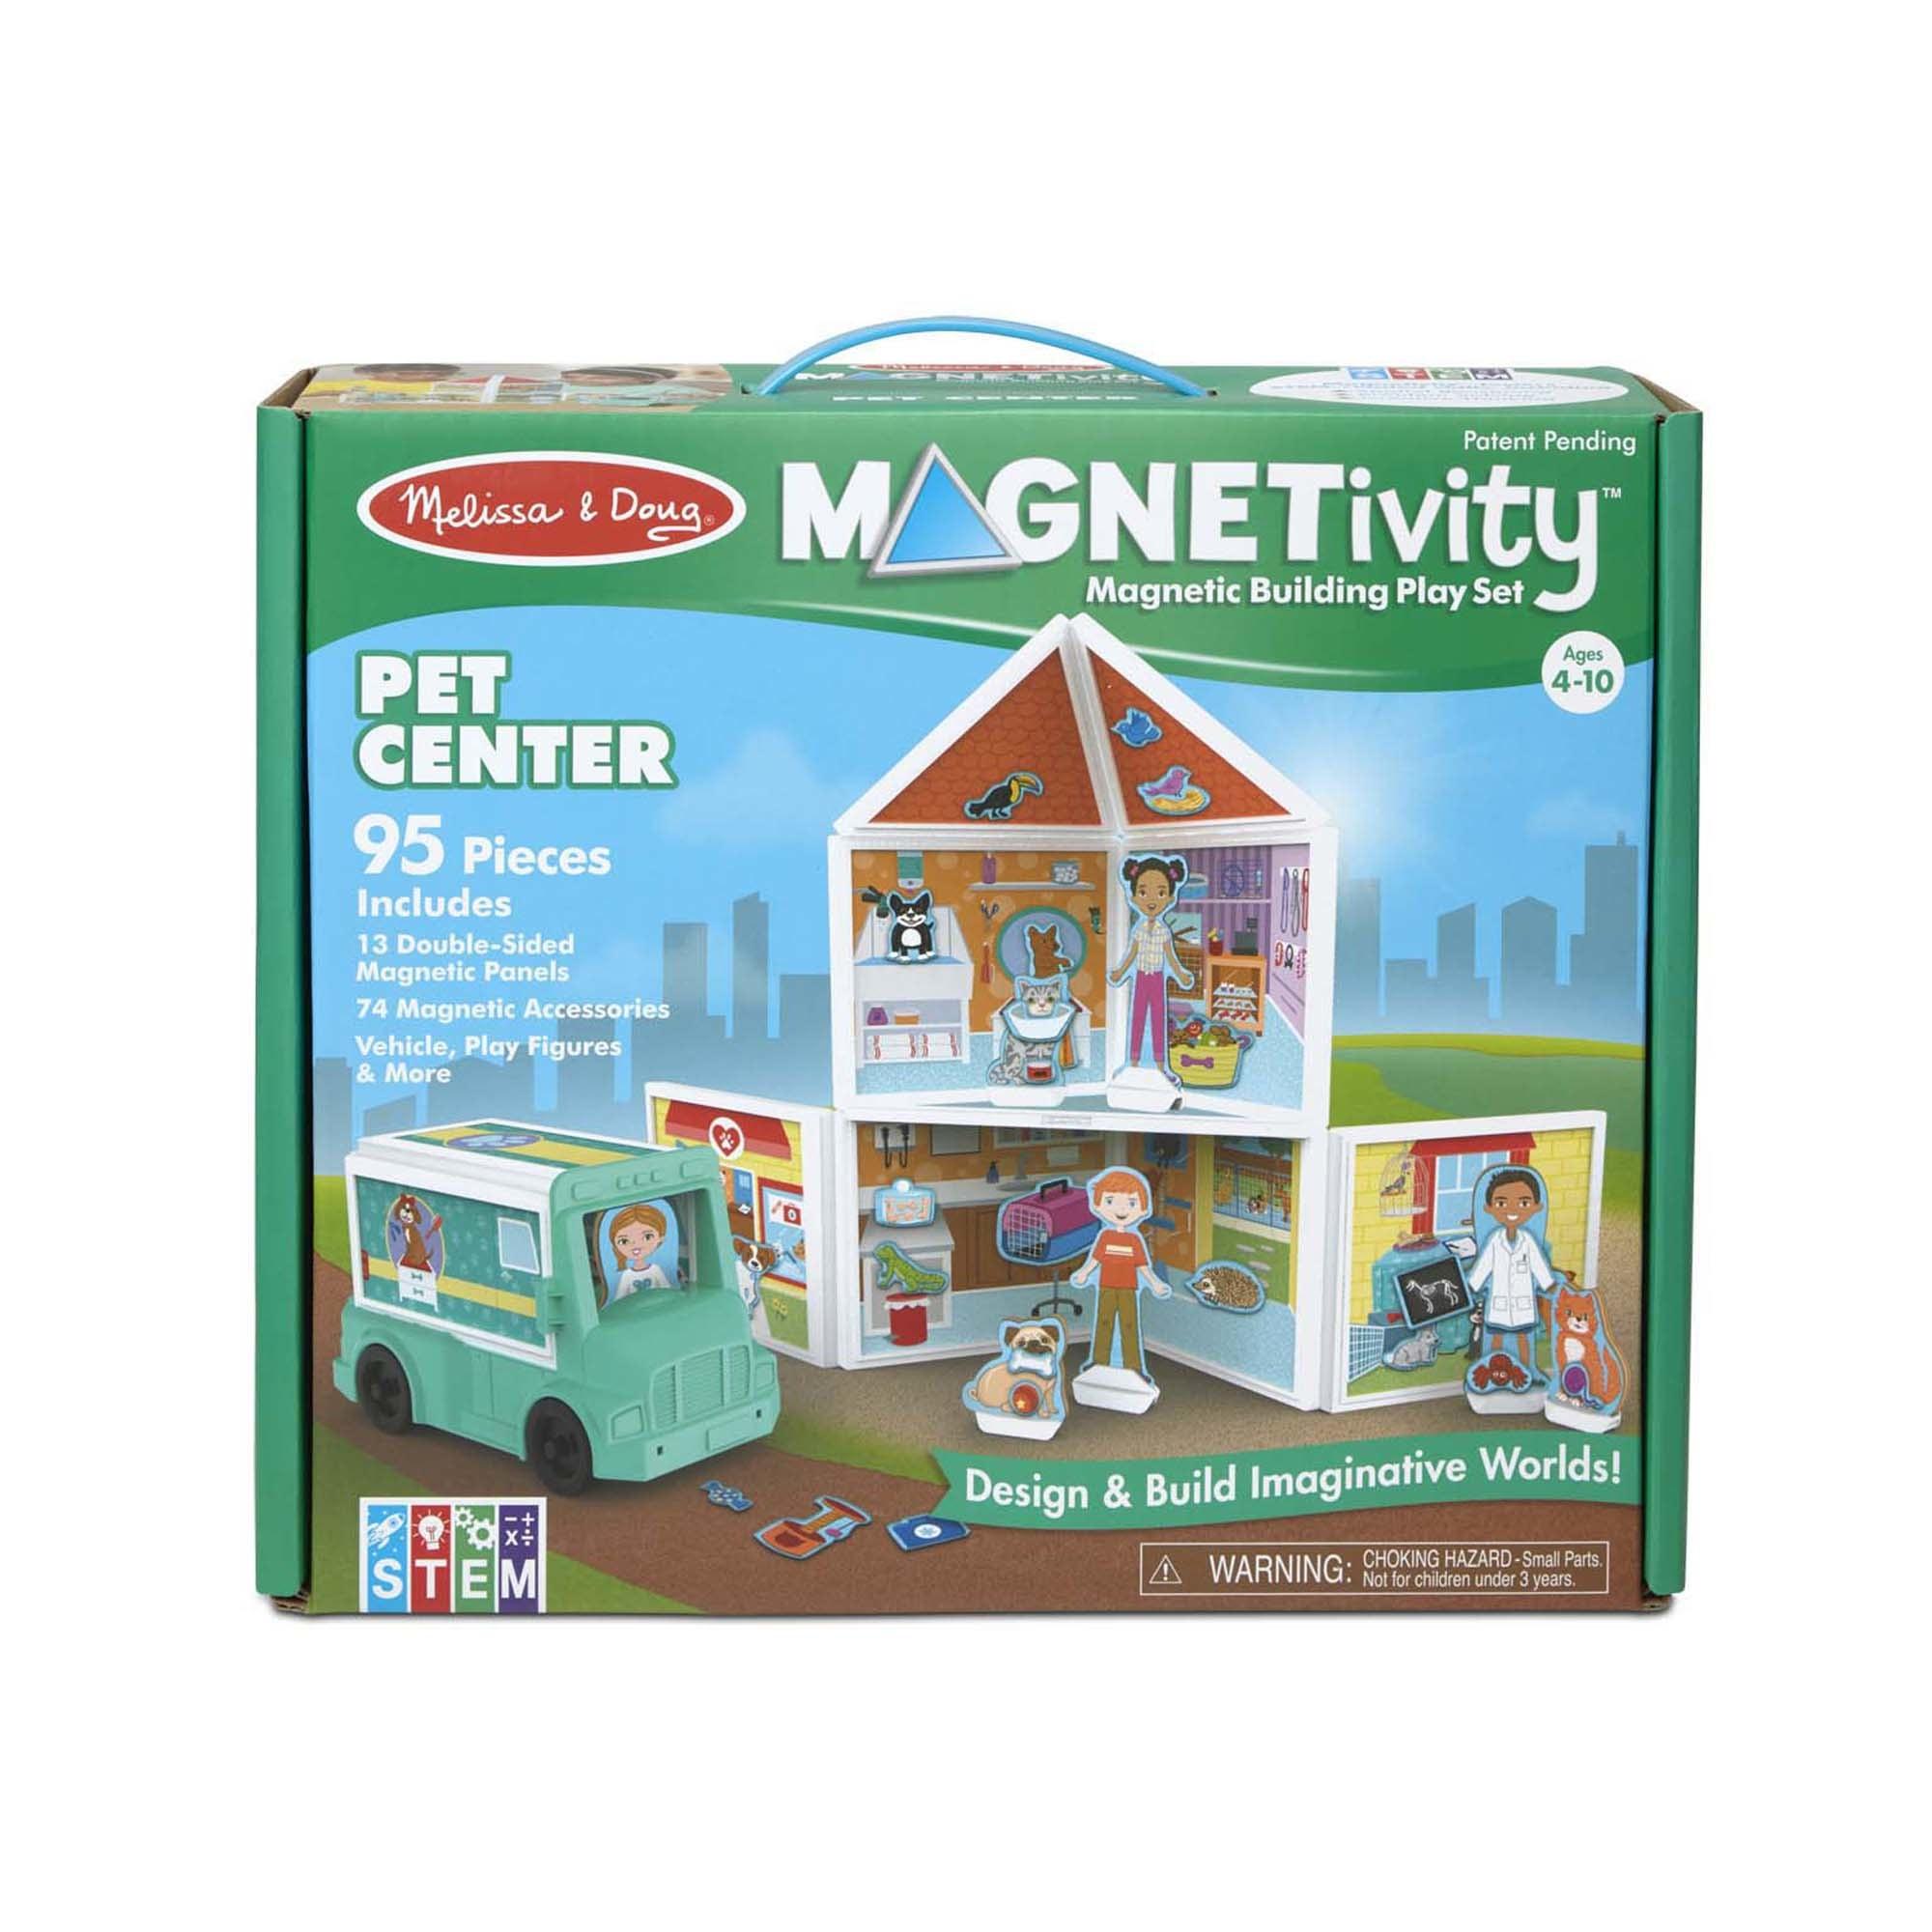 Magnetivity Pet Center-1